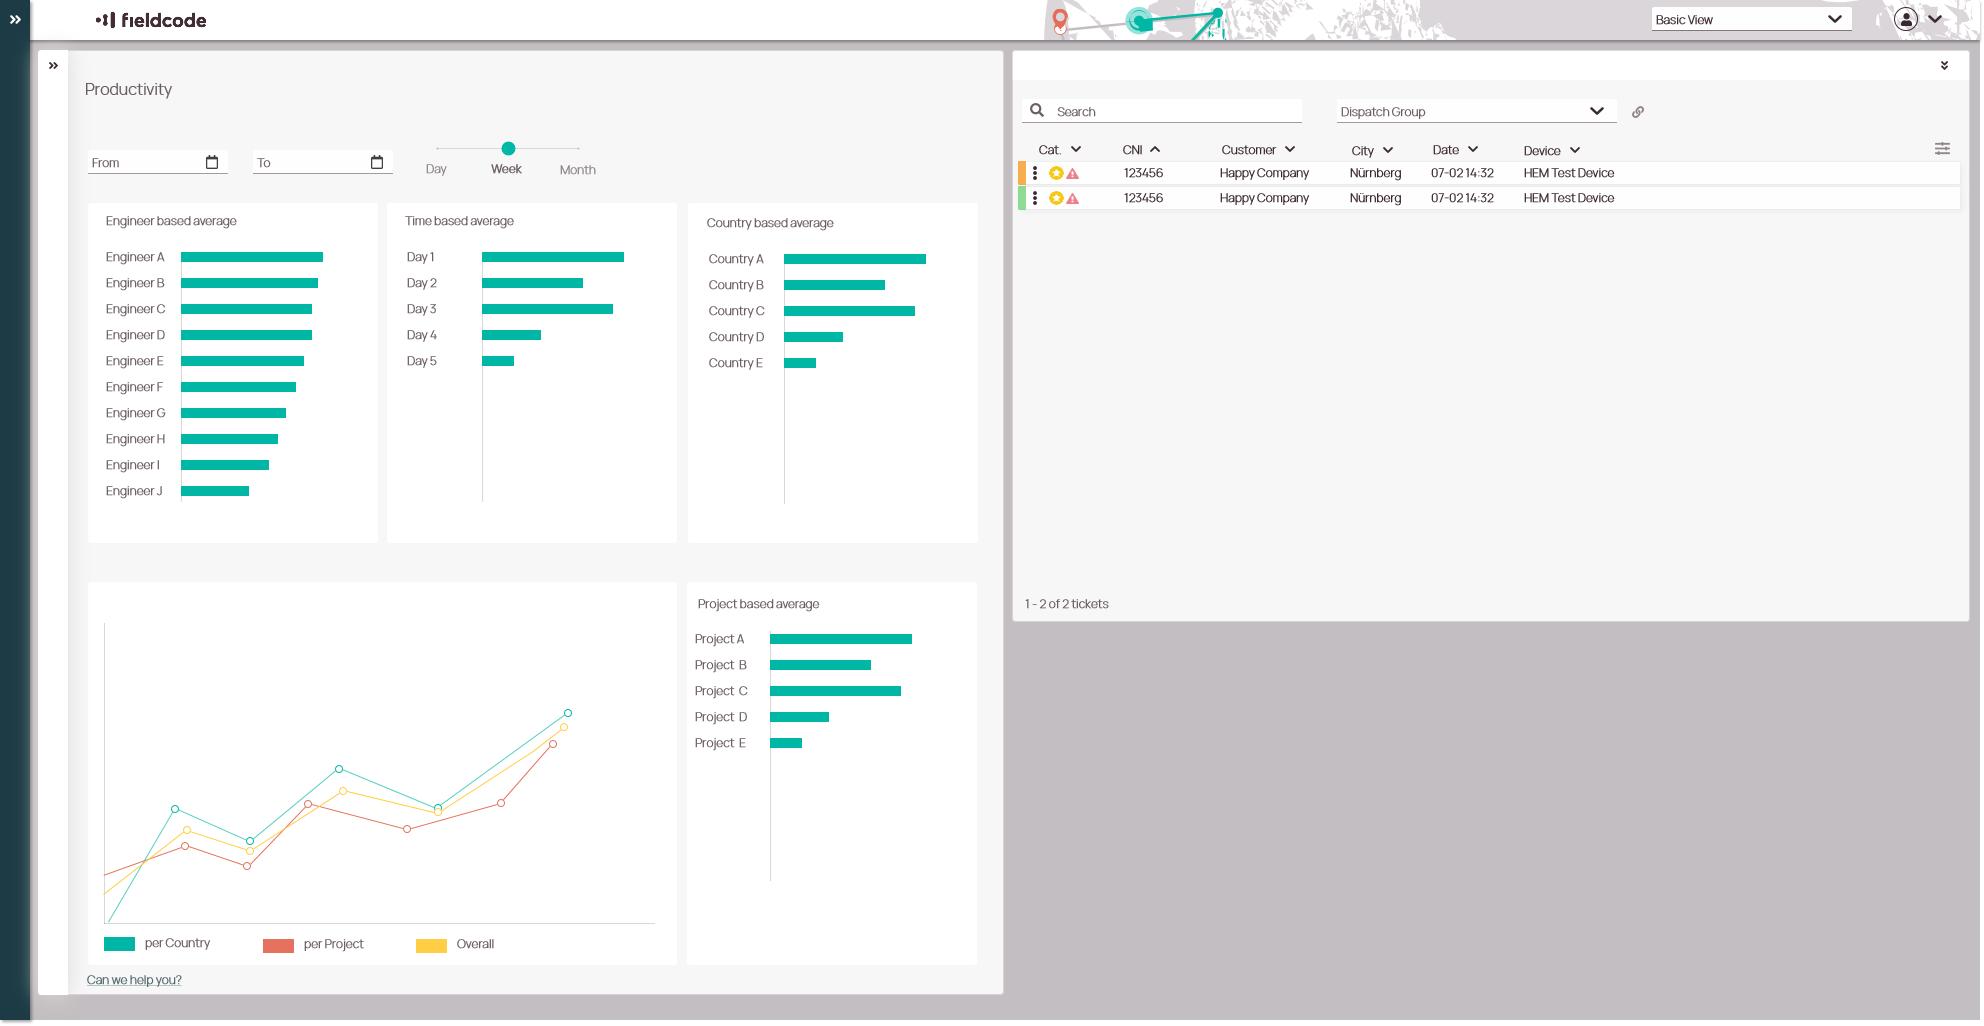 Fieldcode Software - Productivity analytics